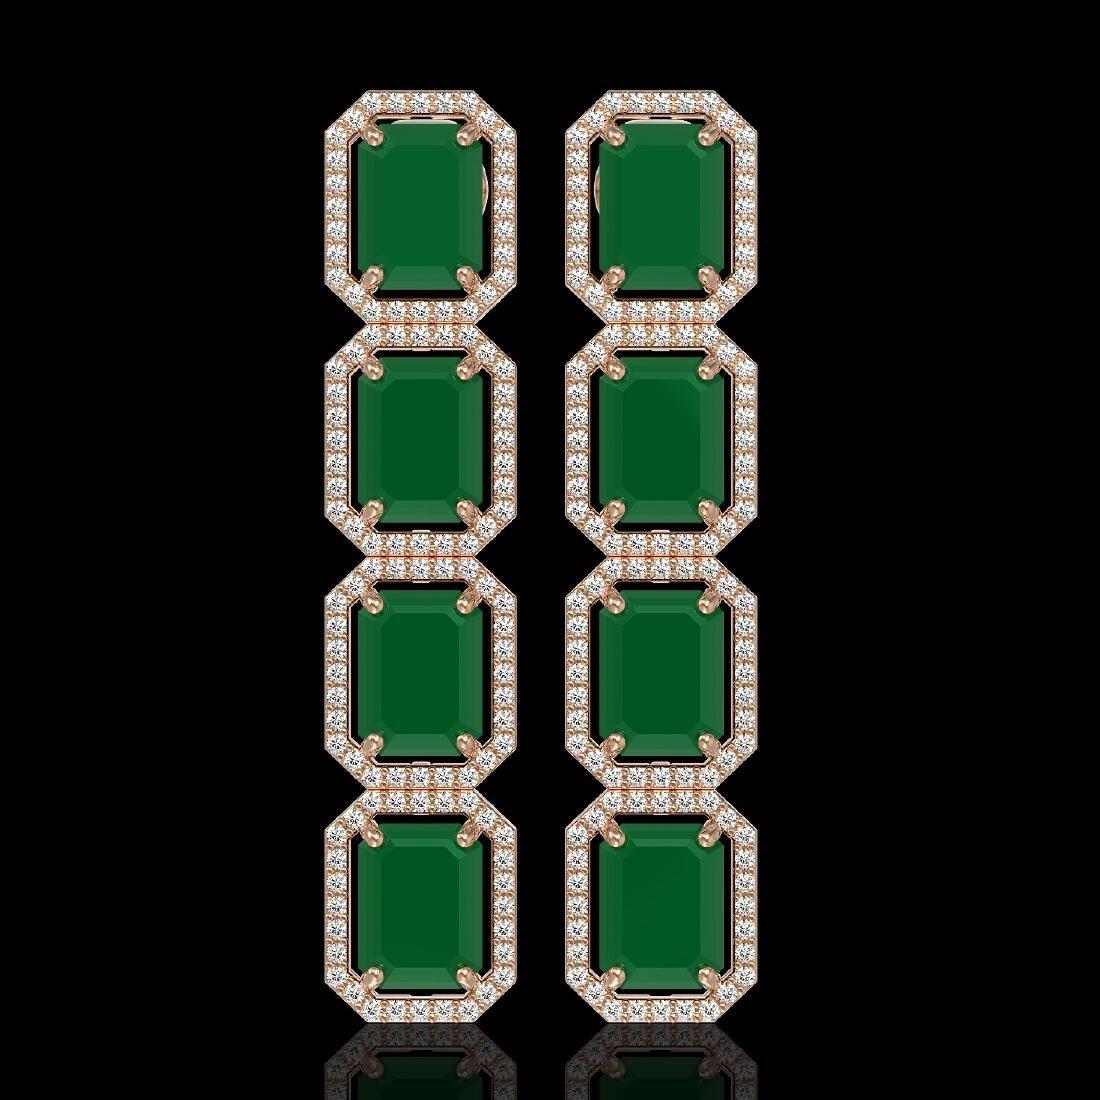 20.59 CTW Emerald & Diamond Halo Earrings 10K Rose Gold